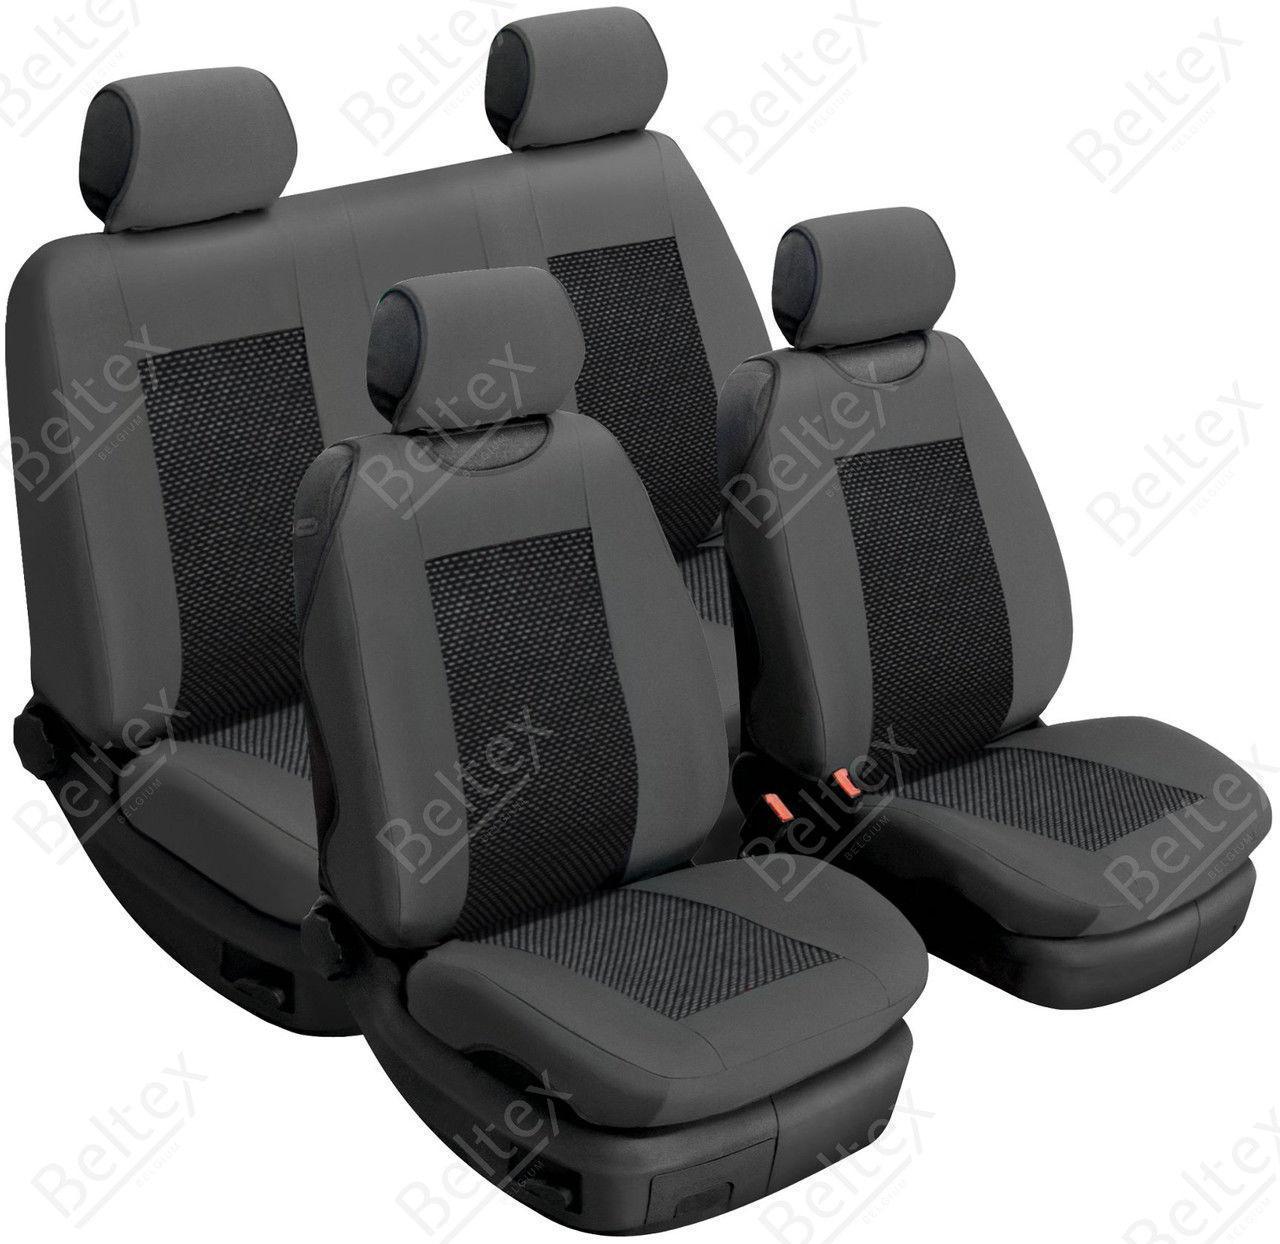 Майки/чехлы на сиденья Хендай Грандер (Hyundai Grandeur)